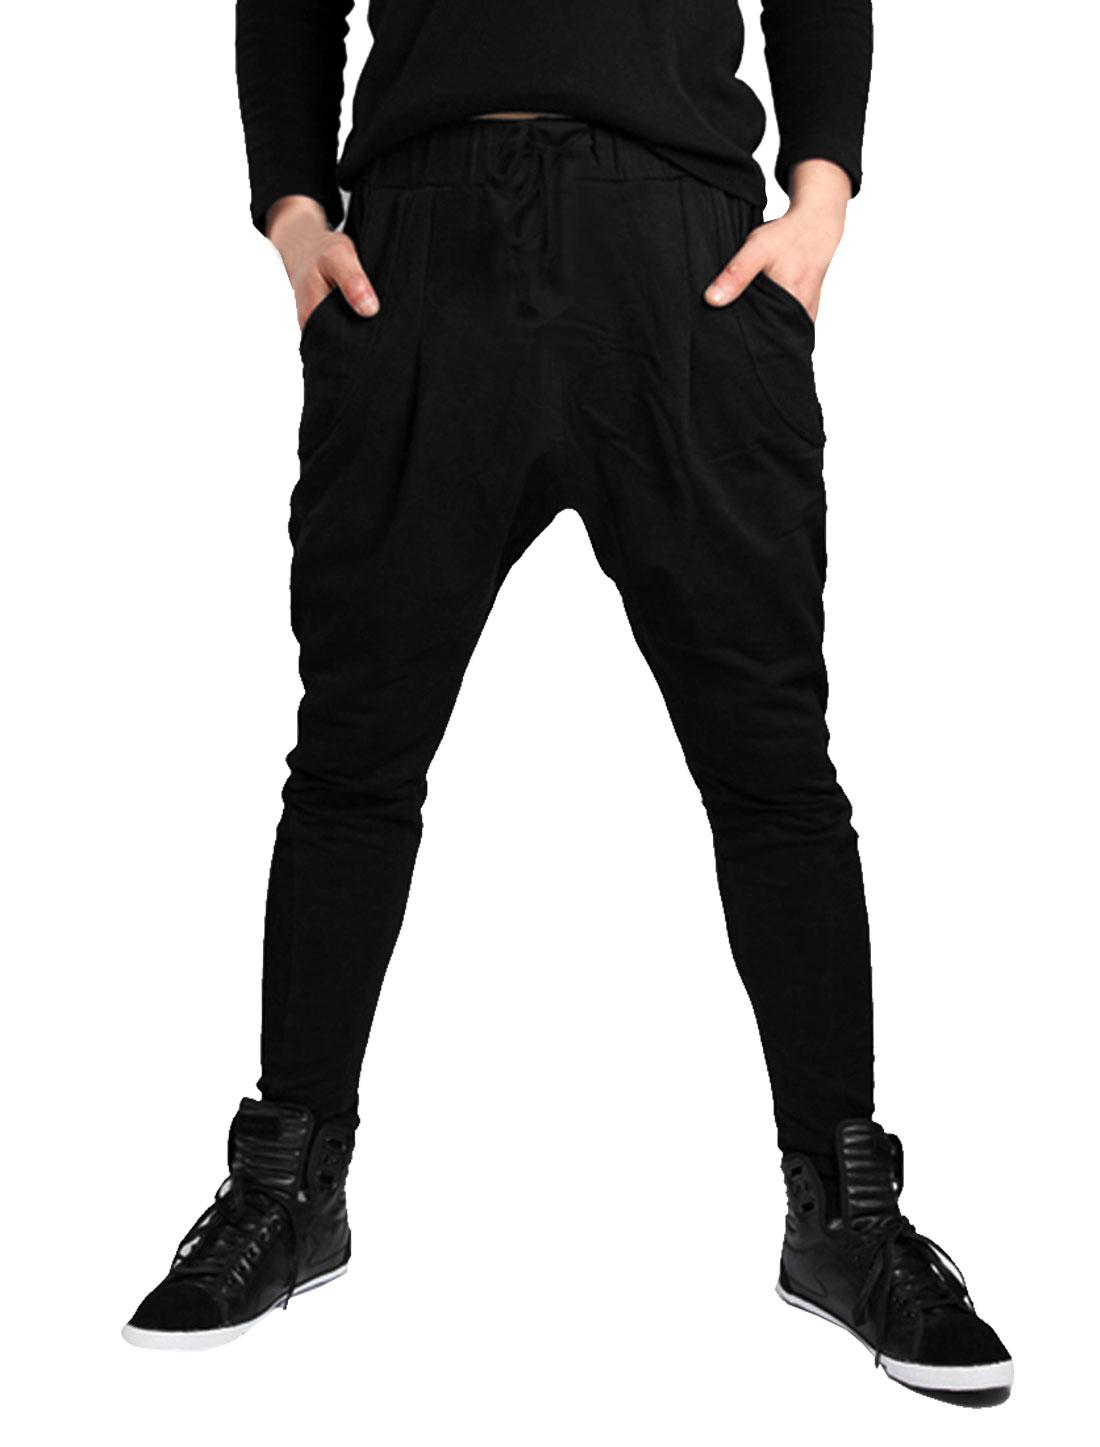 Men Black Stylish Elastic Waist Drawstring Baggy Pockets Casual Harem Pants W30